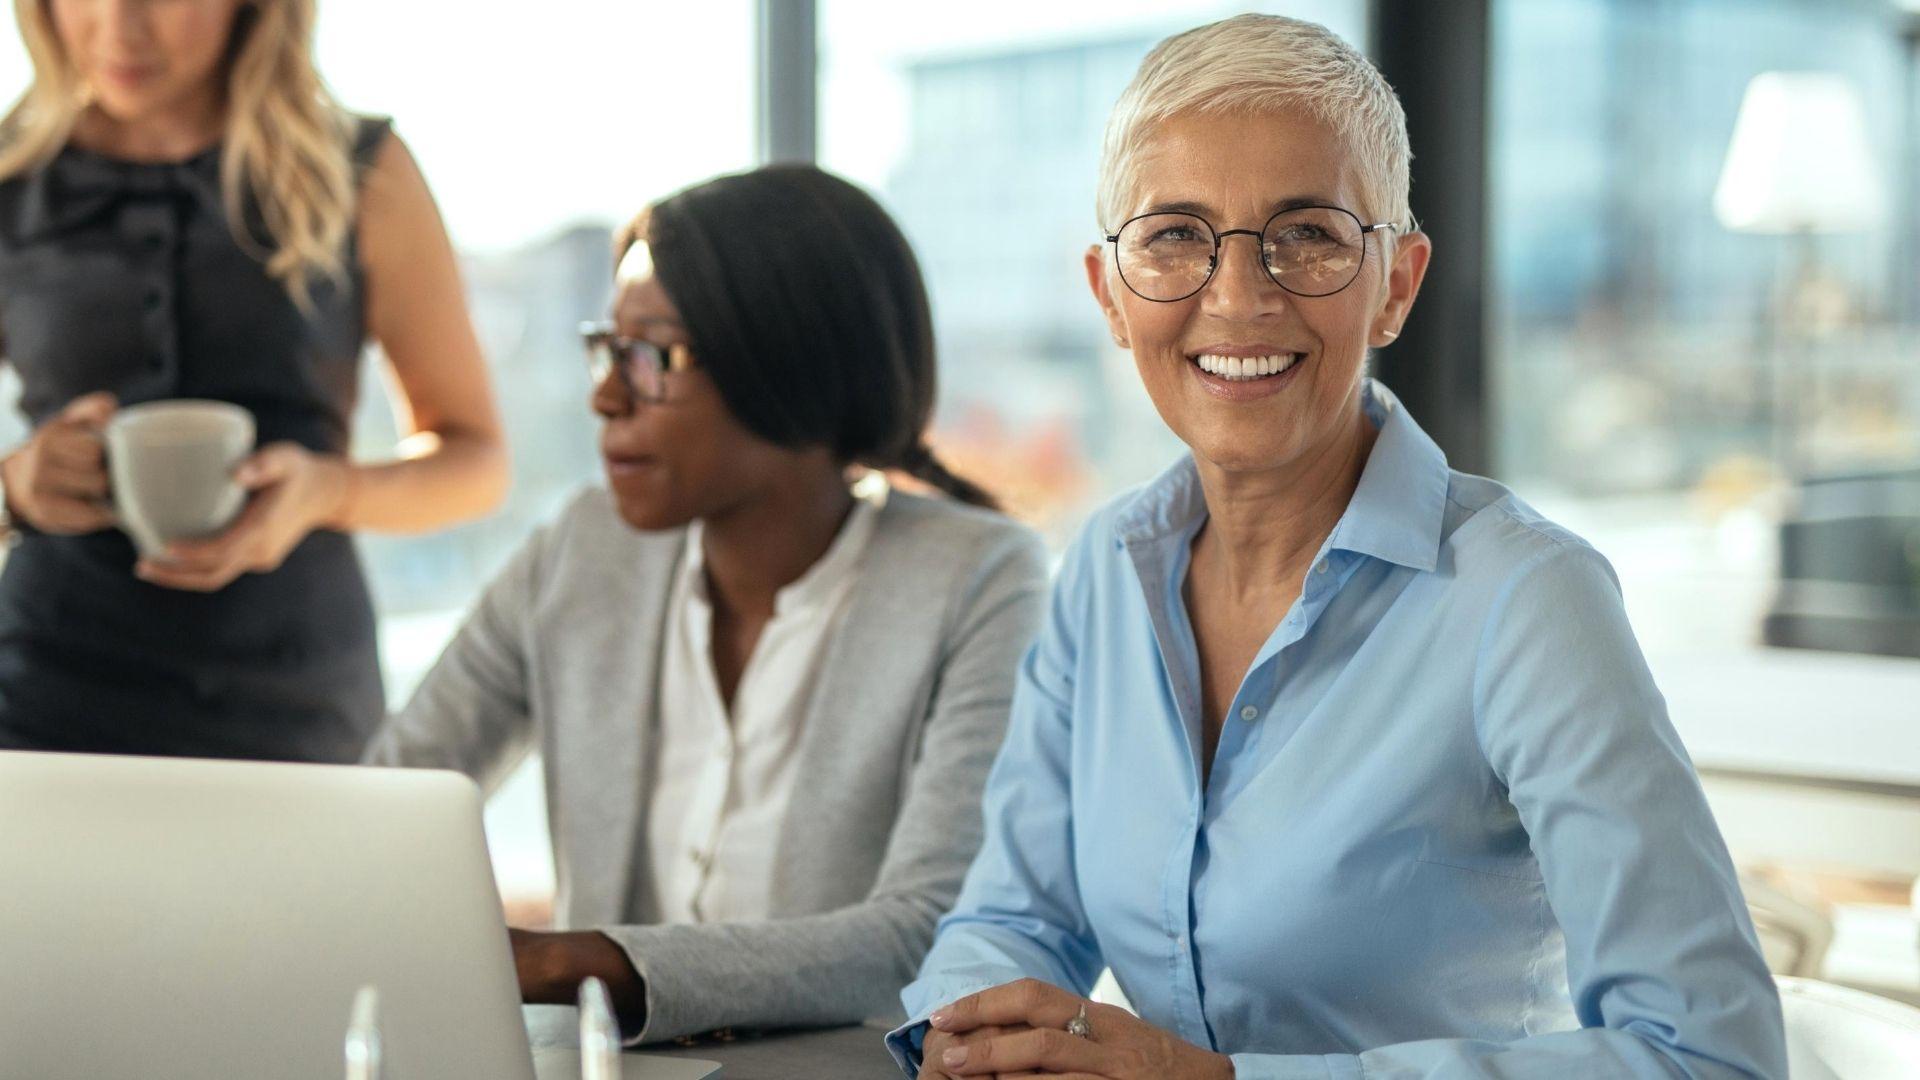 Laechelnde Frau waehrend Unternehmens Leadership Coaching